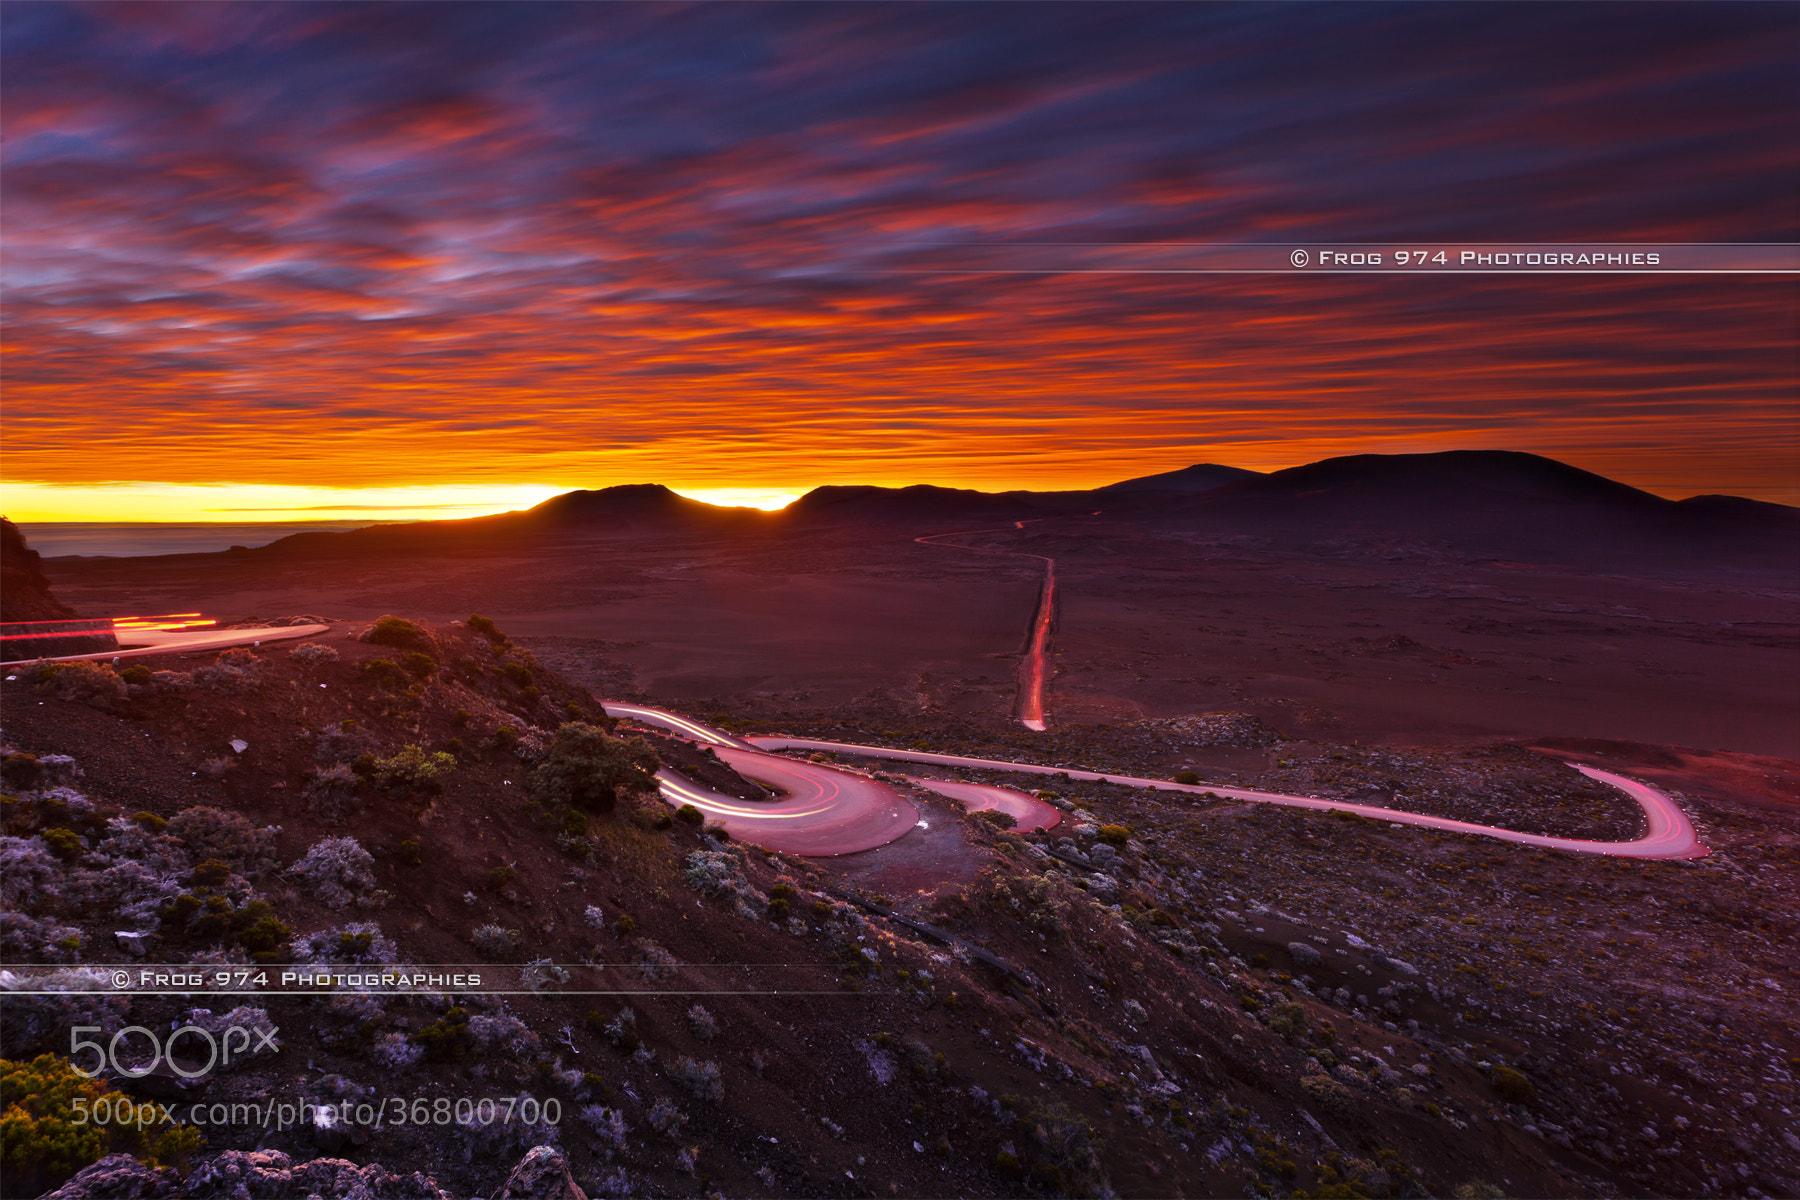 Photograph Sunrise on Plaine des Sables by Franck GRONDIN on 500px